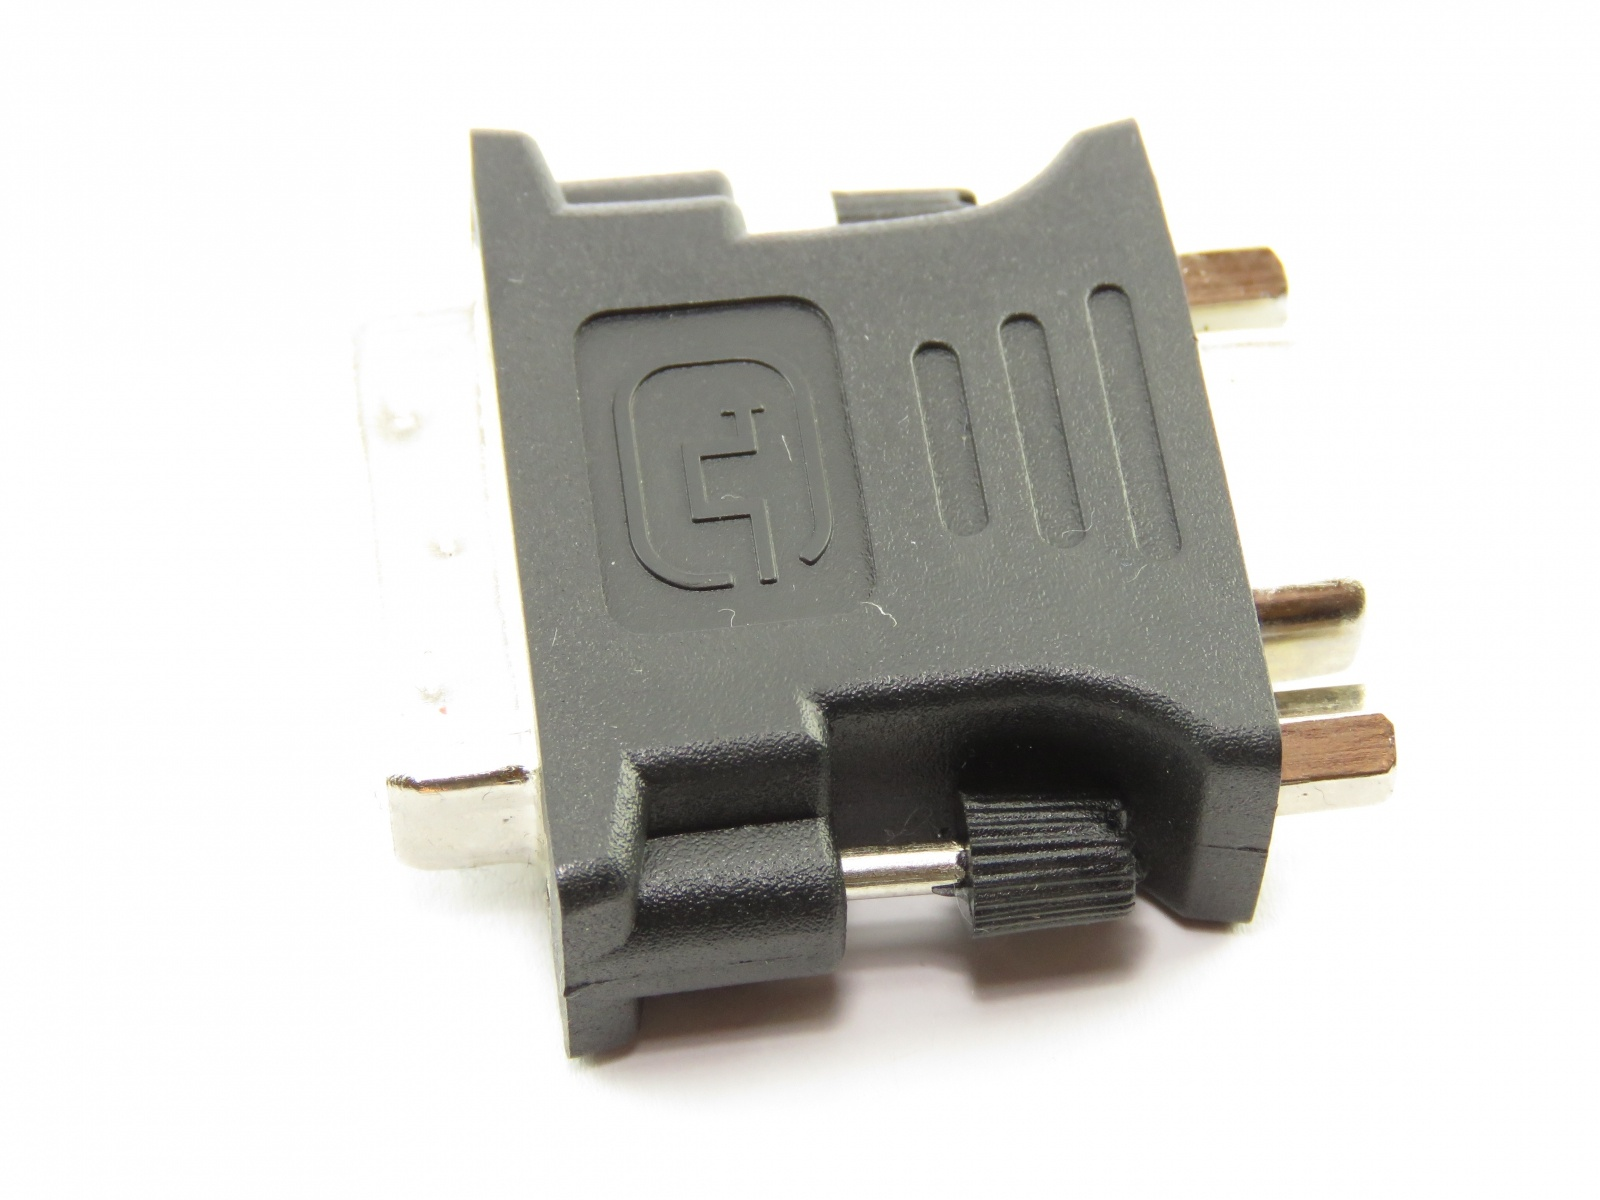 Adaptateur DVI GC-DVIM15F-HD (image 4/4)